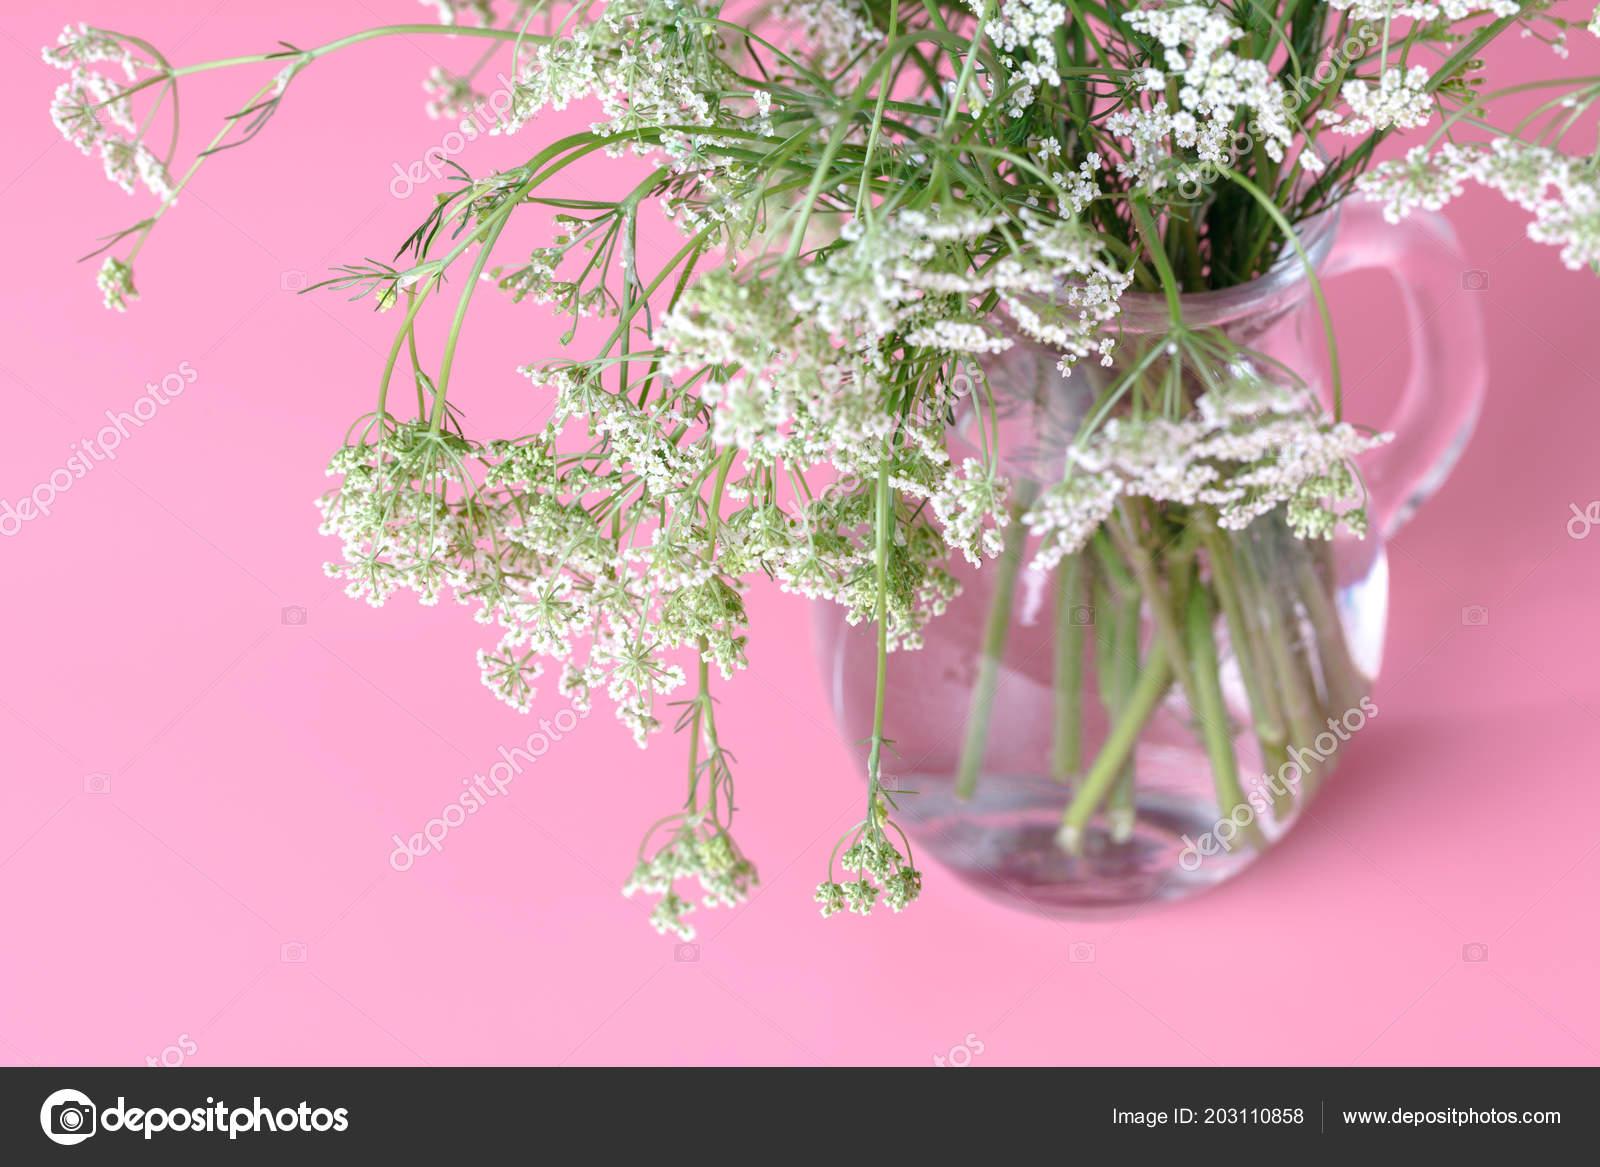 Small Fragrant Spring Flowers Stock Photo Andreycherkasov 203110858